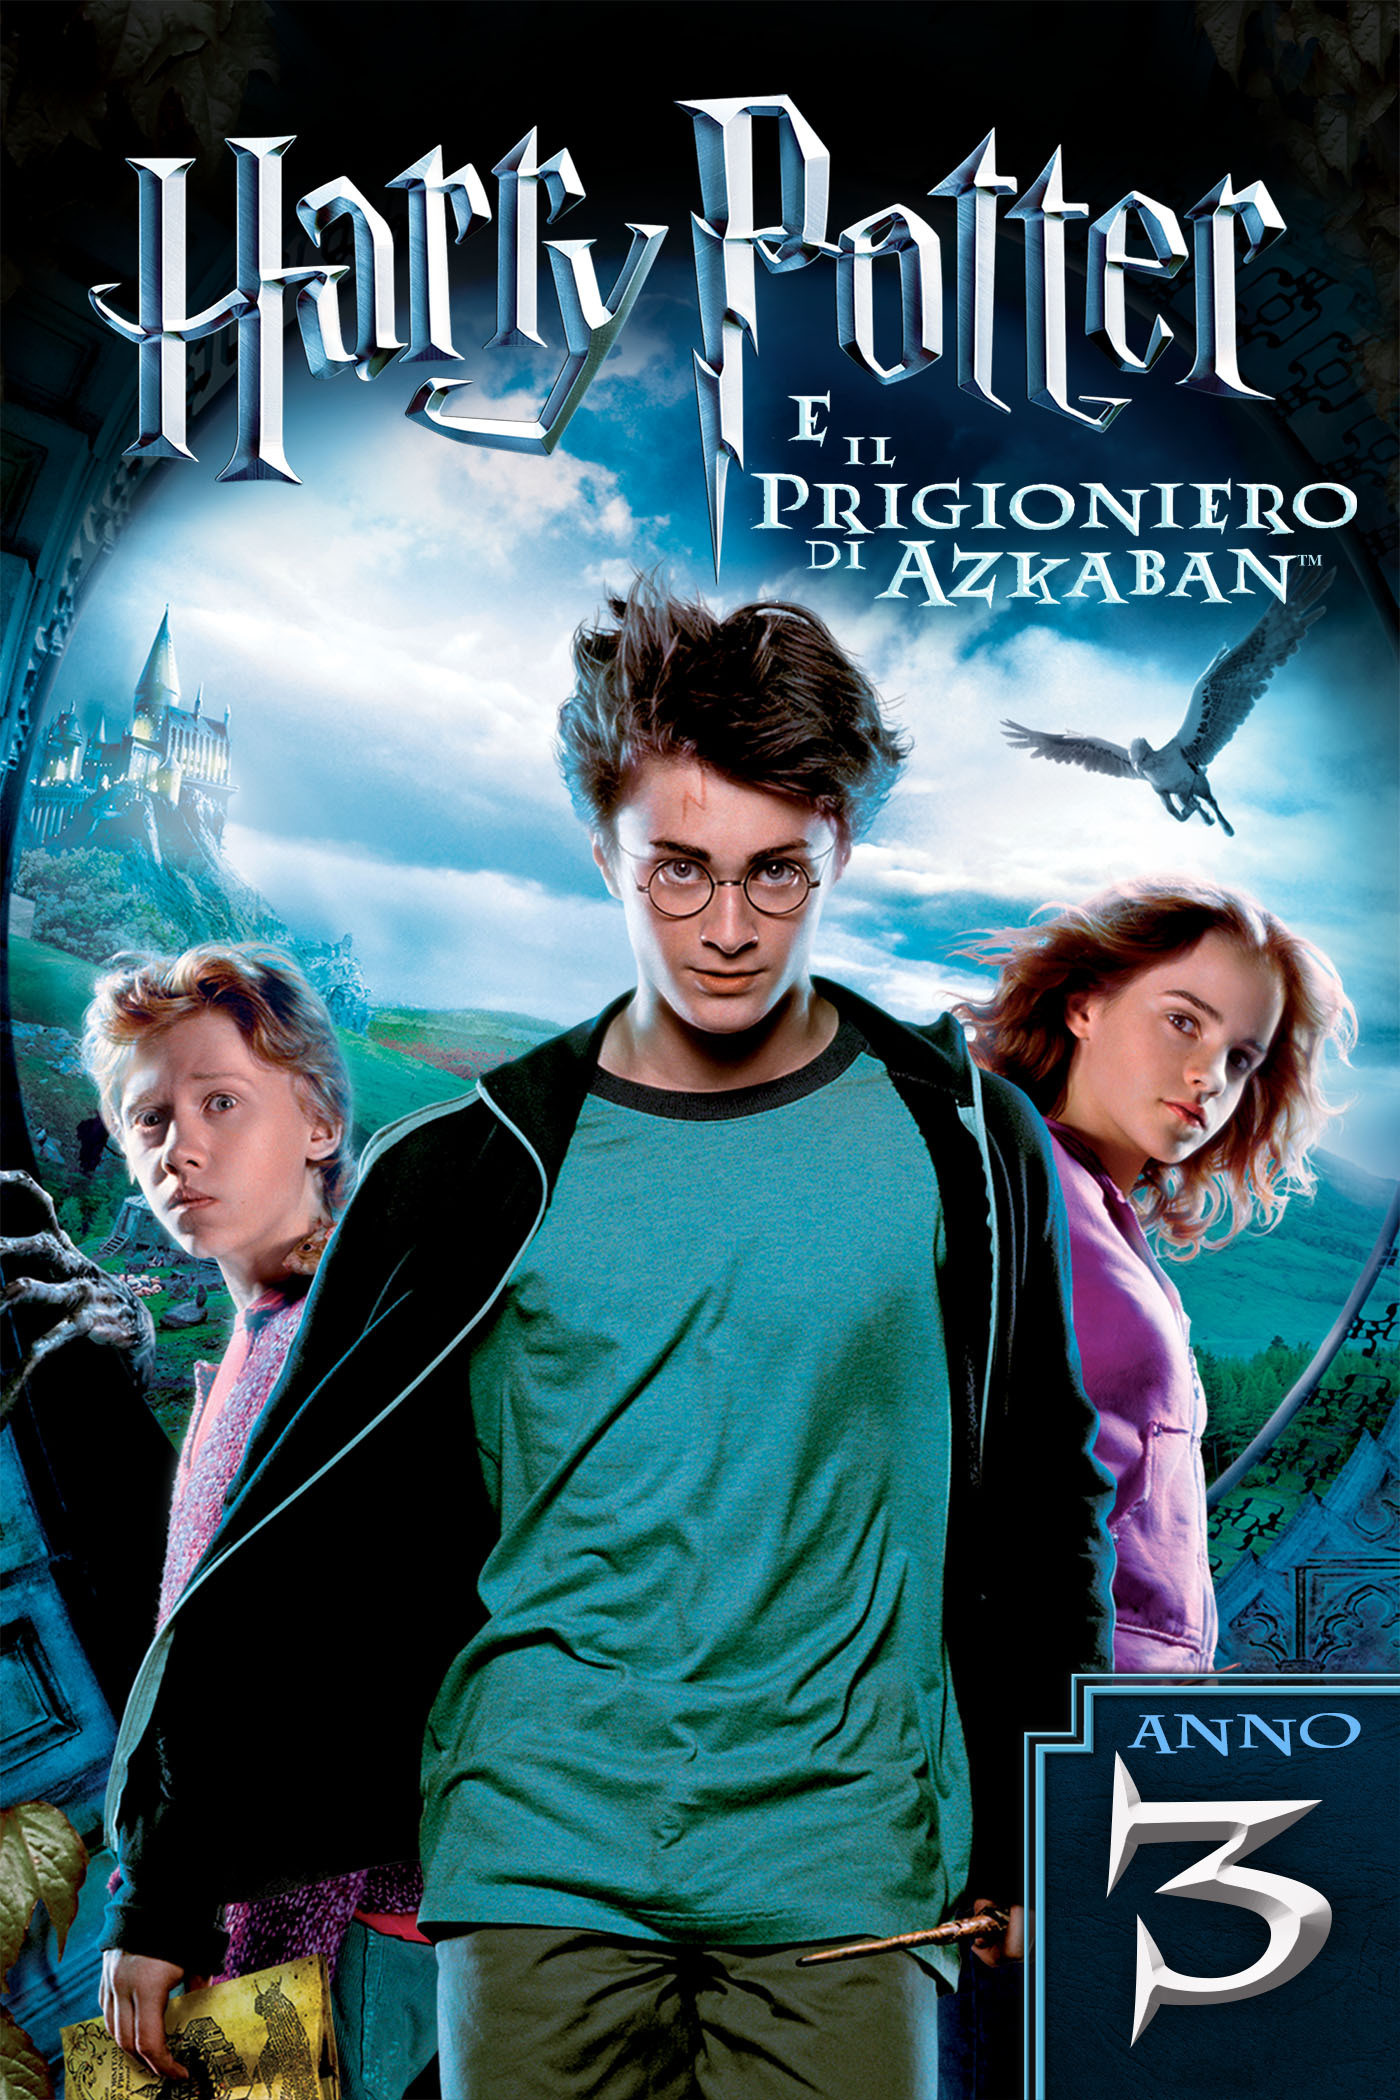 Harry potter e il prigioniero di azkaban (harry potter and the prisoner of azkaban)